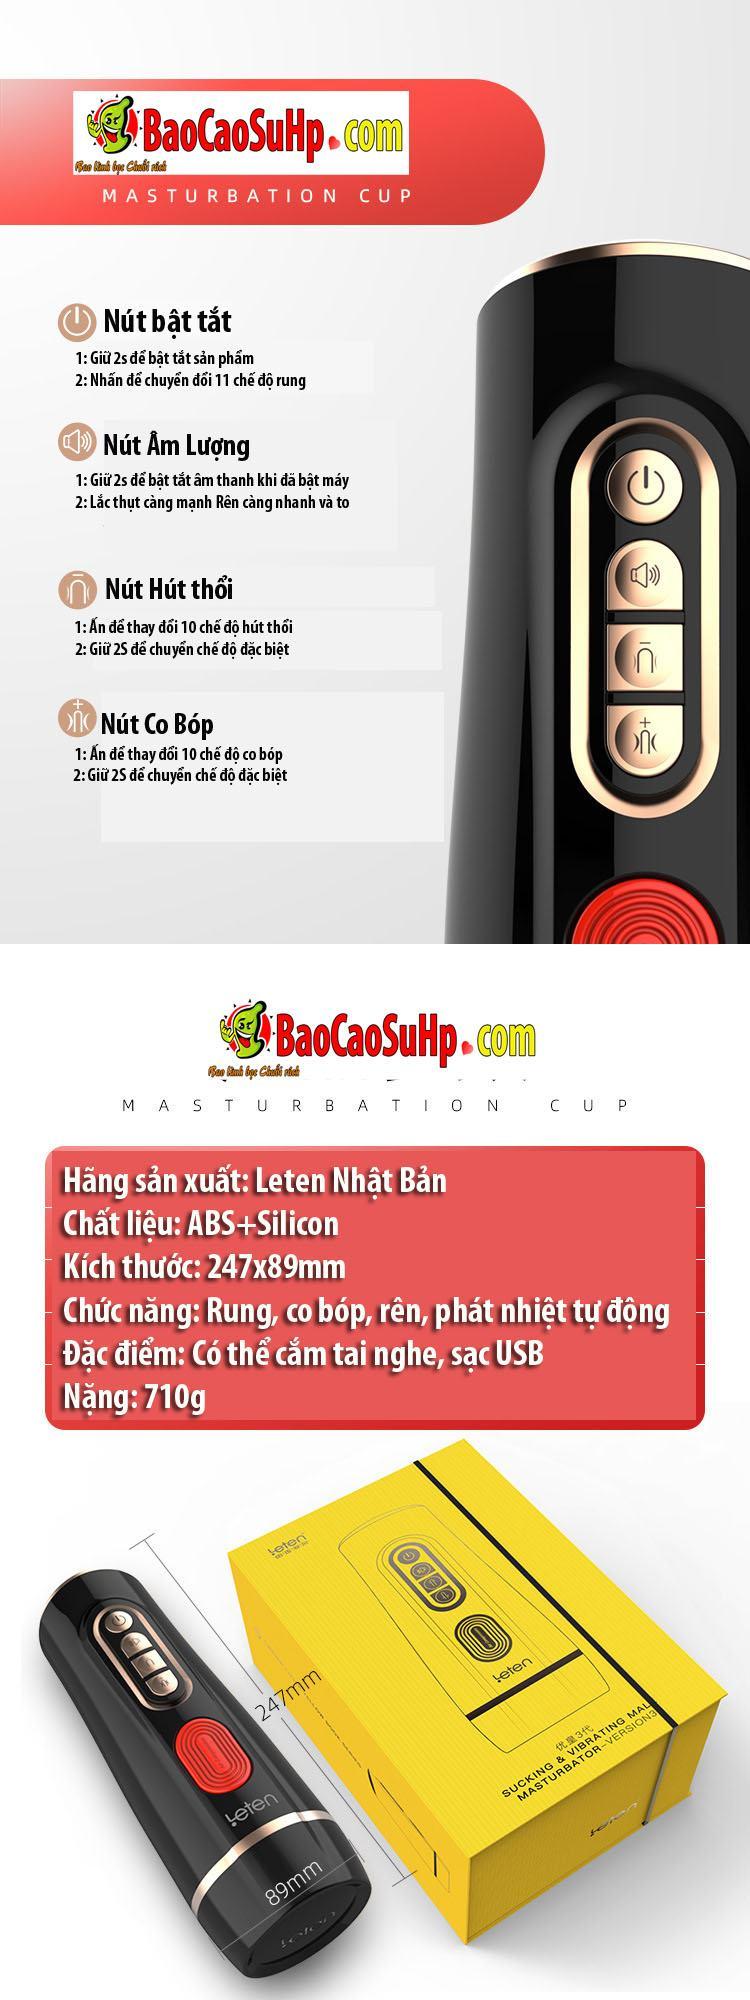 coc am dao Leten co bop Youhuang Eve Life 2021 5 - Cốc thủ dâm tự động Leten co bóp Youhuang Eve Life phiên bản 2021